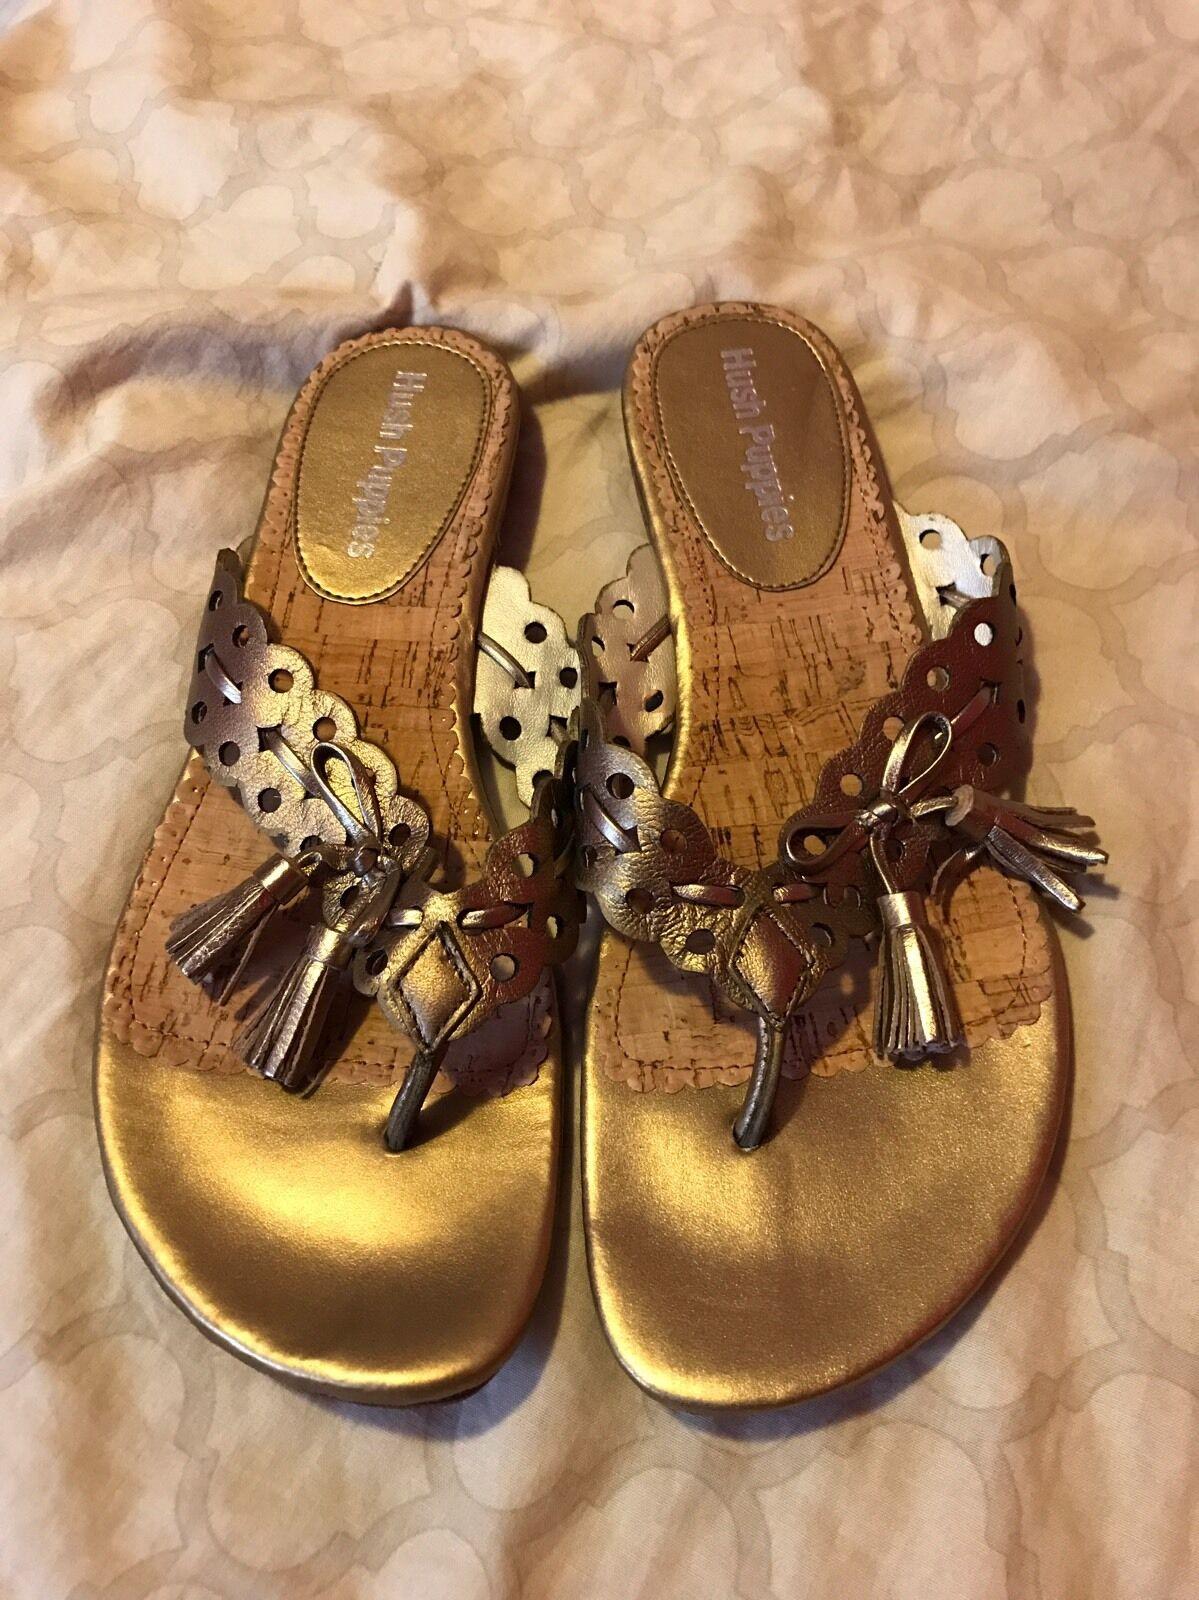 Hush 7M Puppies Women Shoes Size 7M Hush Brown Leather Flip Flops (box) 7e39a9